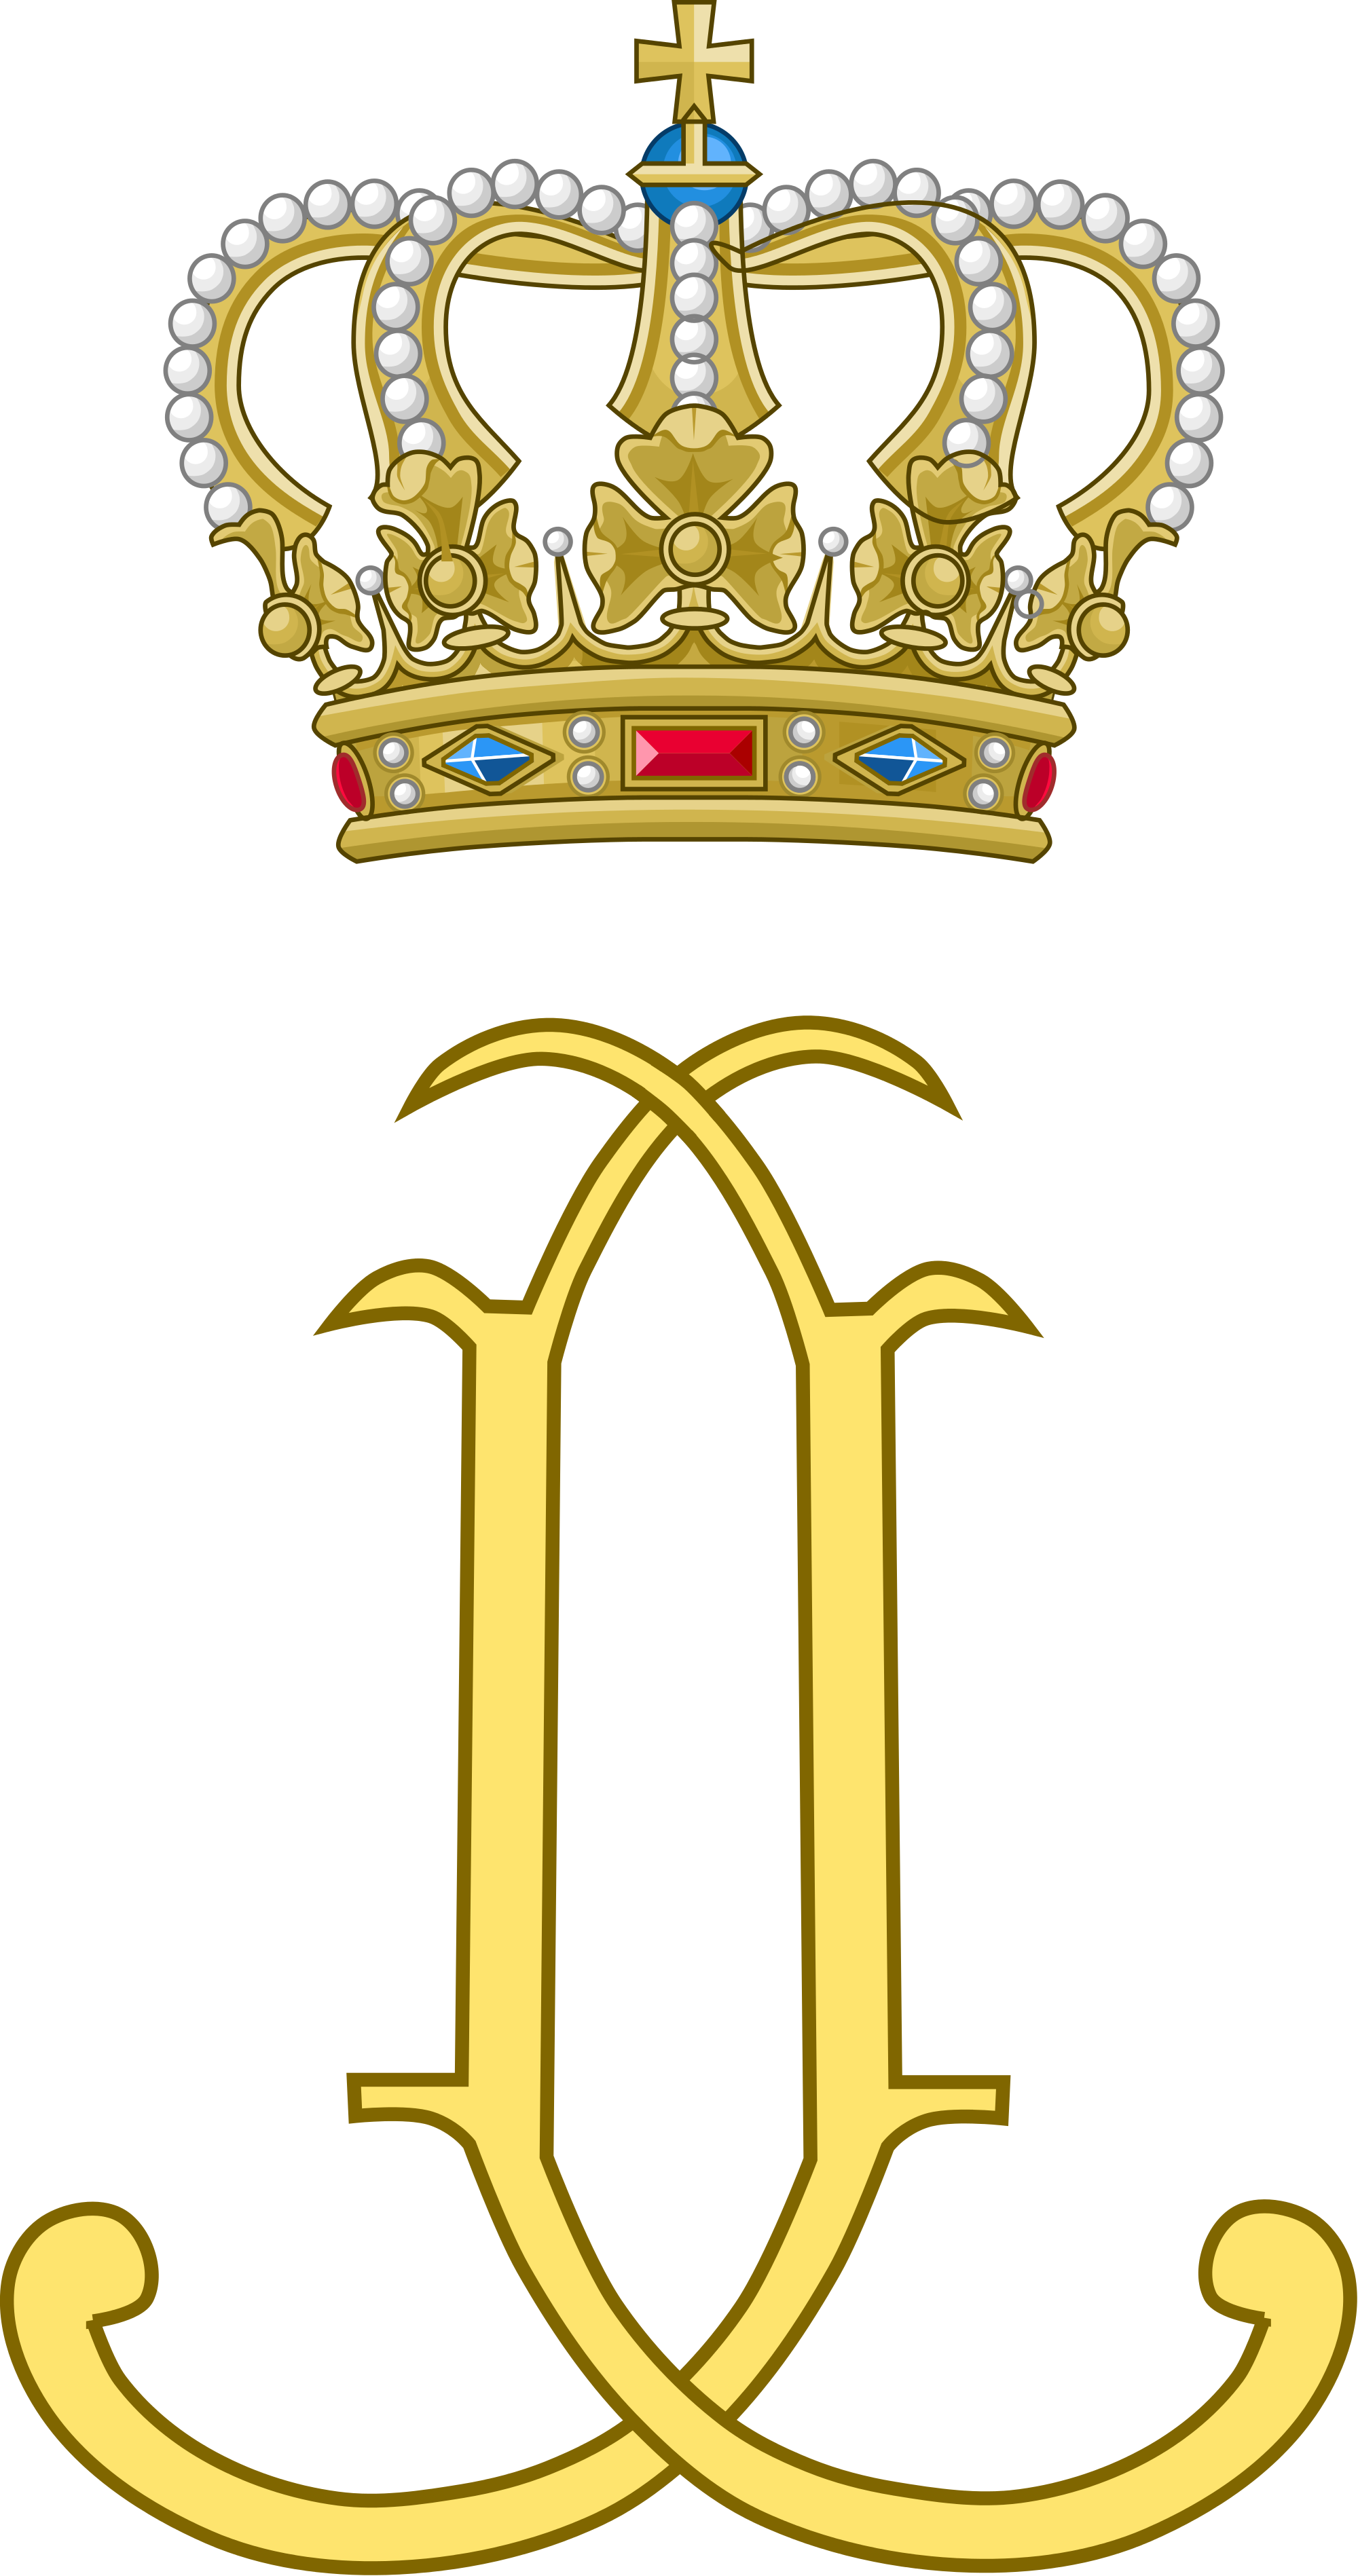 Crown monogram clipart clip art free Grand Duke Jean and Grand Duchess Josephine Charlotte of Luxembourg ... clip art free